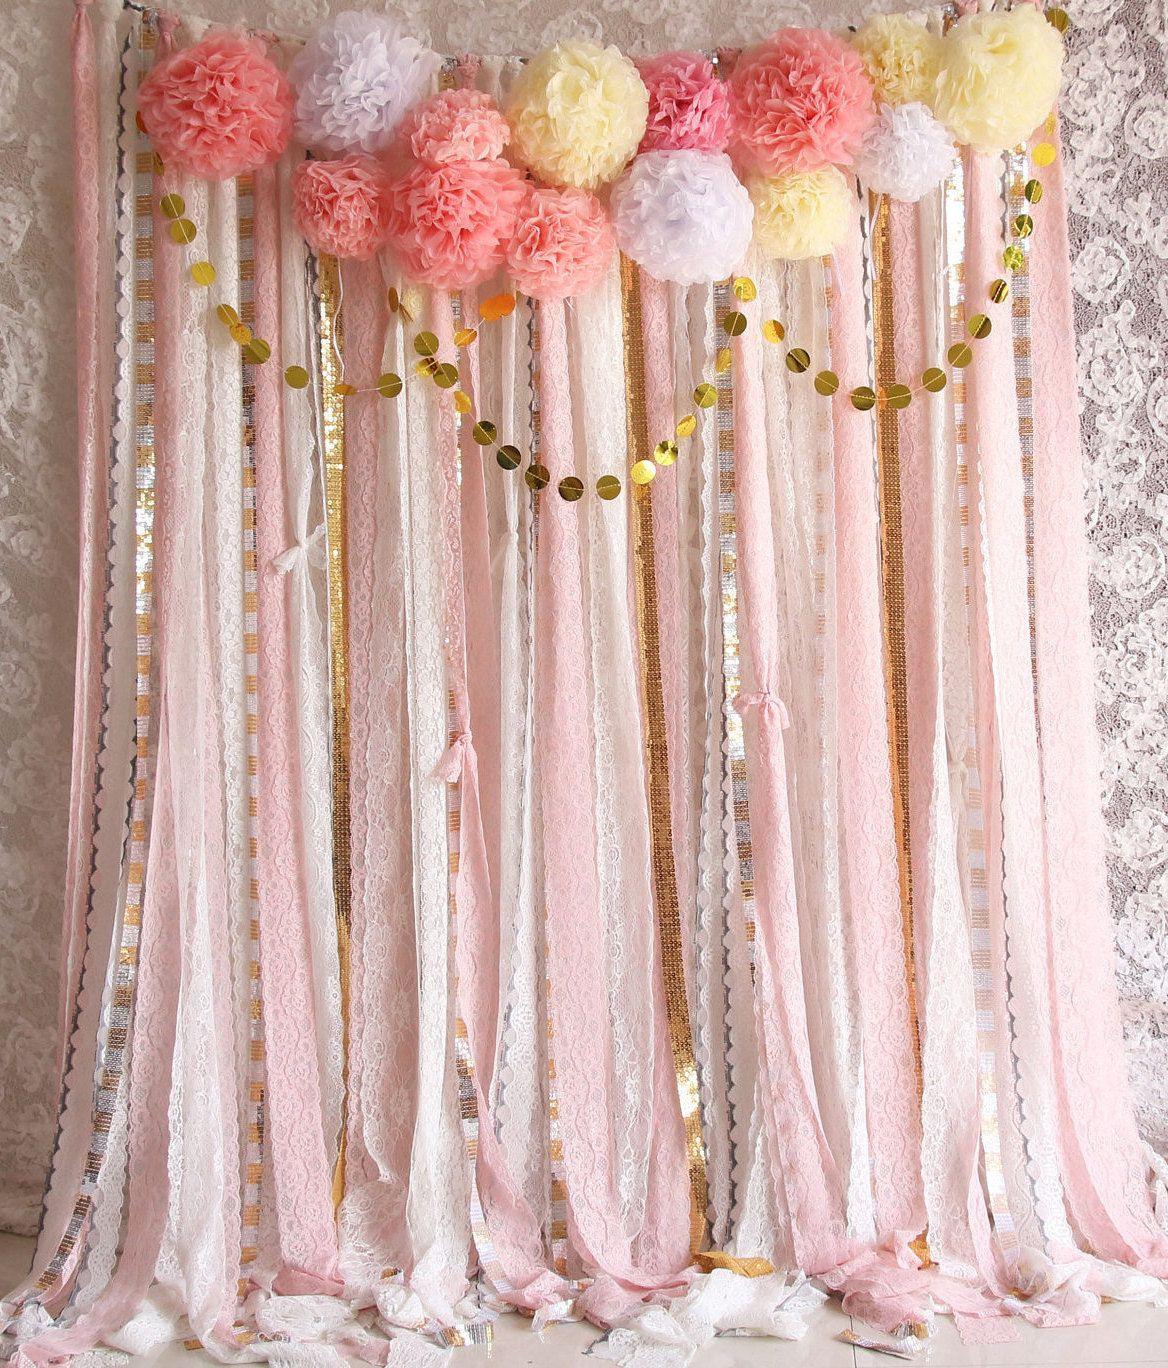 DIY Baby Shower Backdrop  Pink white Lace Pom Poms flowers Sparkle fabric backdrop